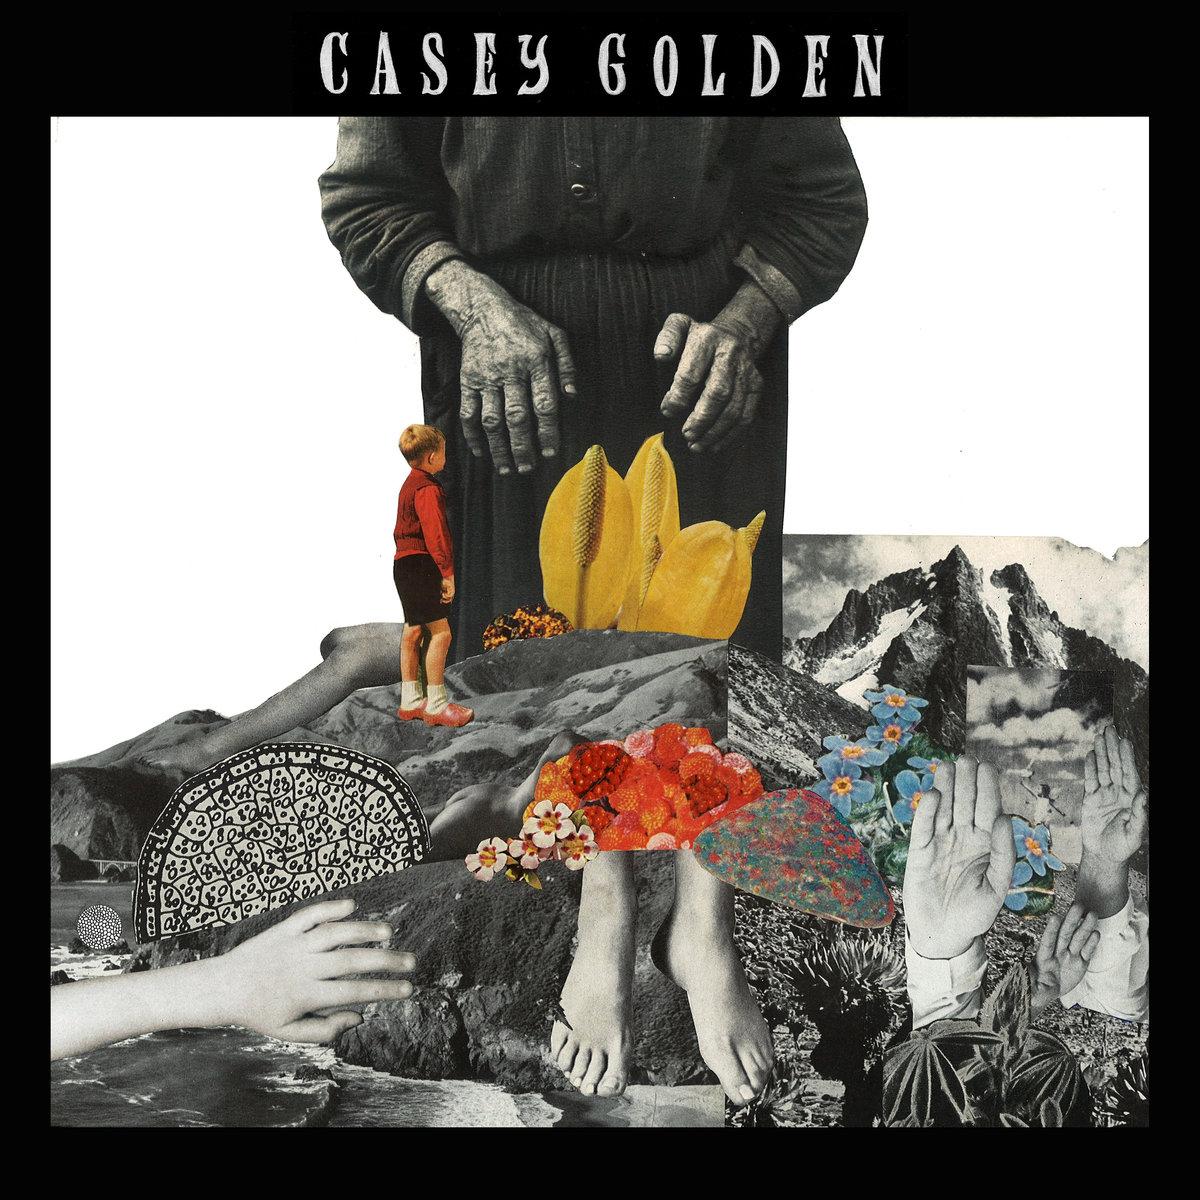 Casey Golden album artwork